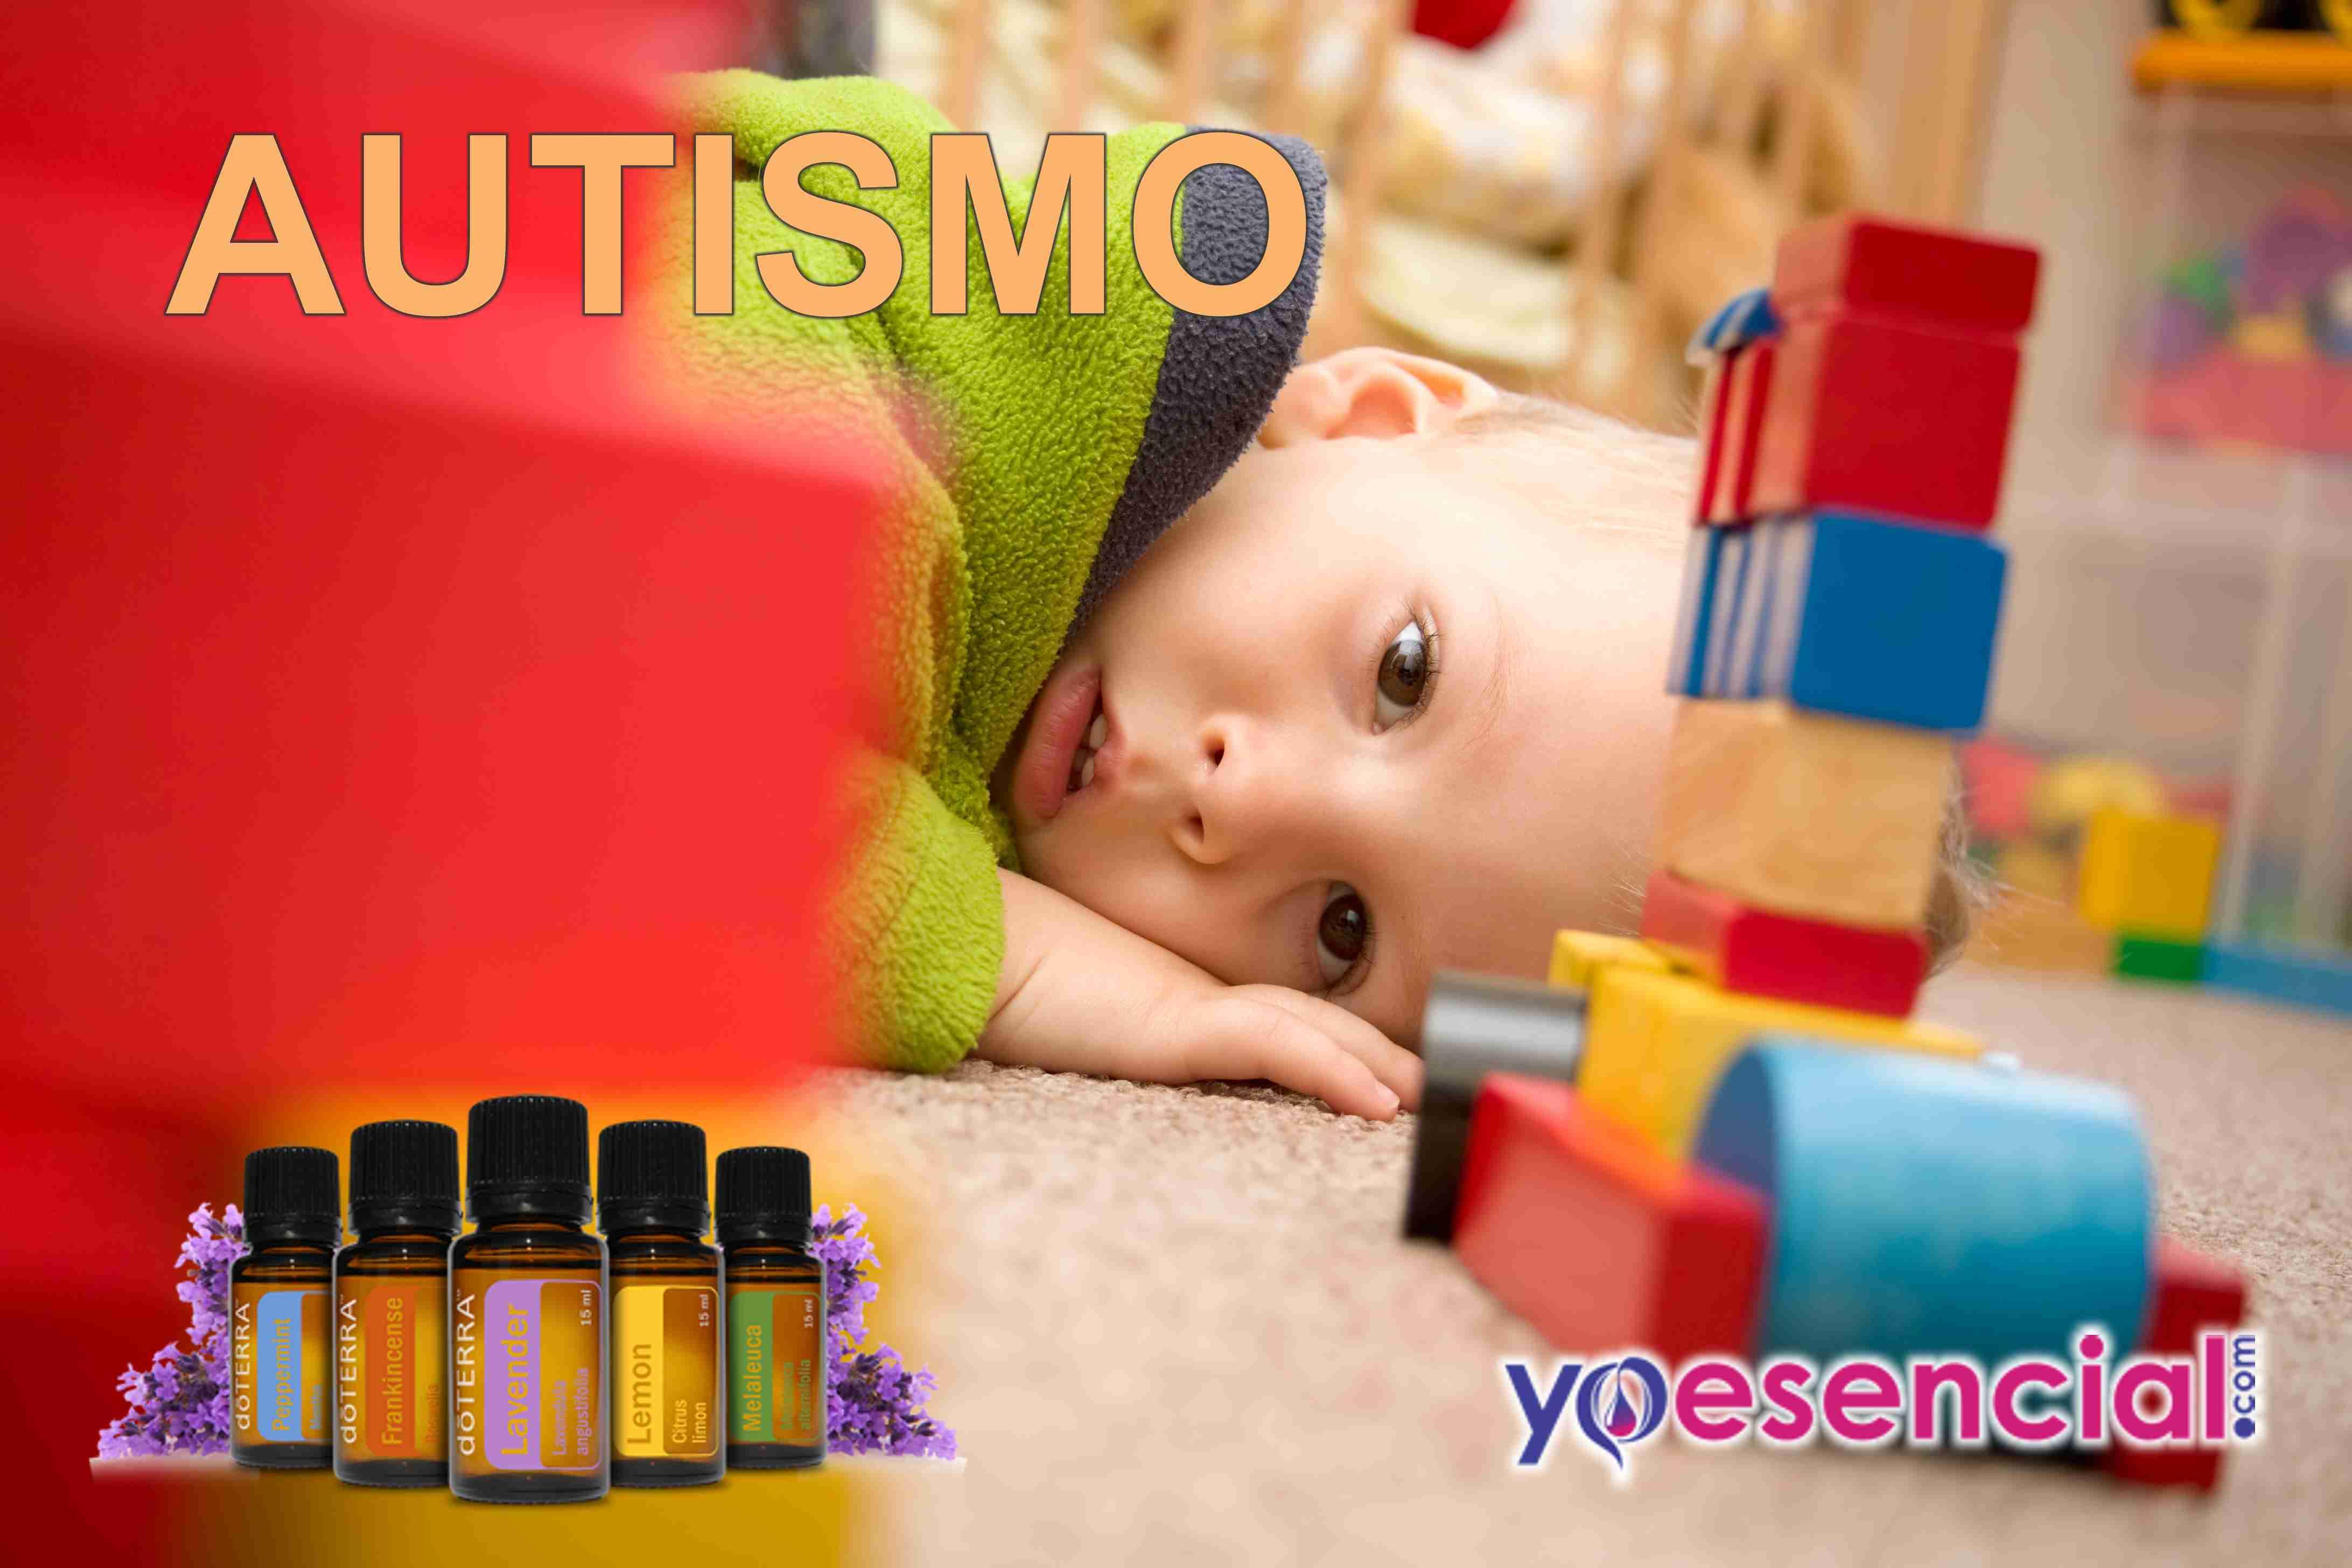 autismo usa aceites esenciales